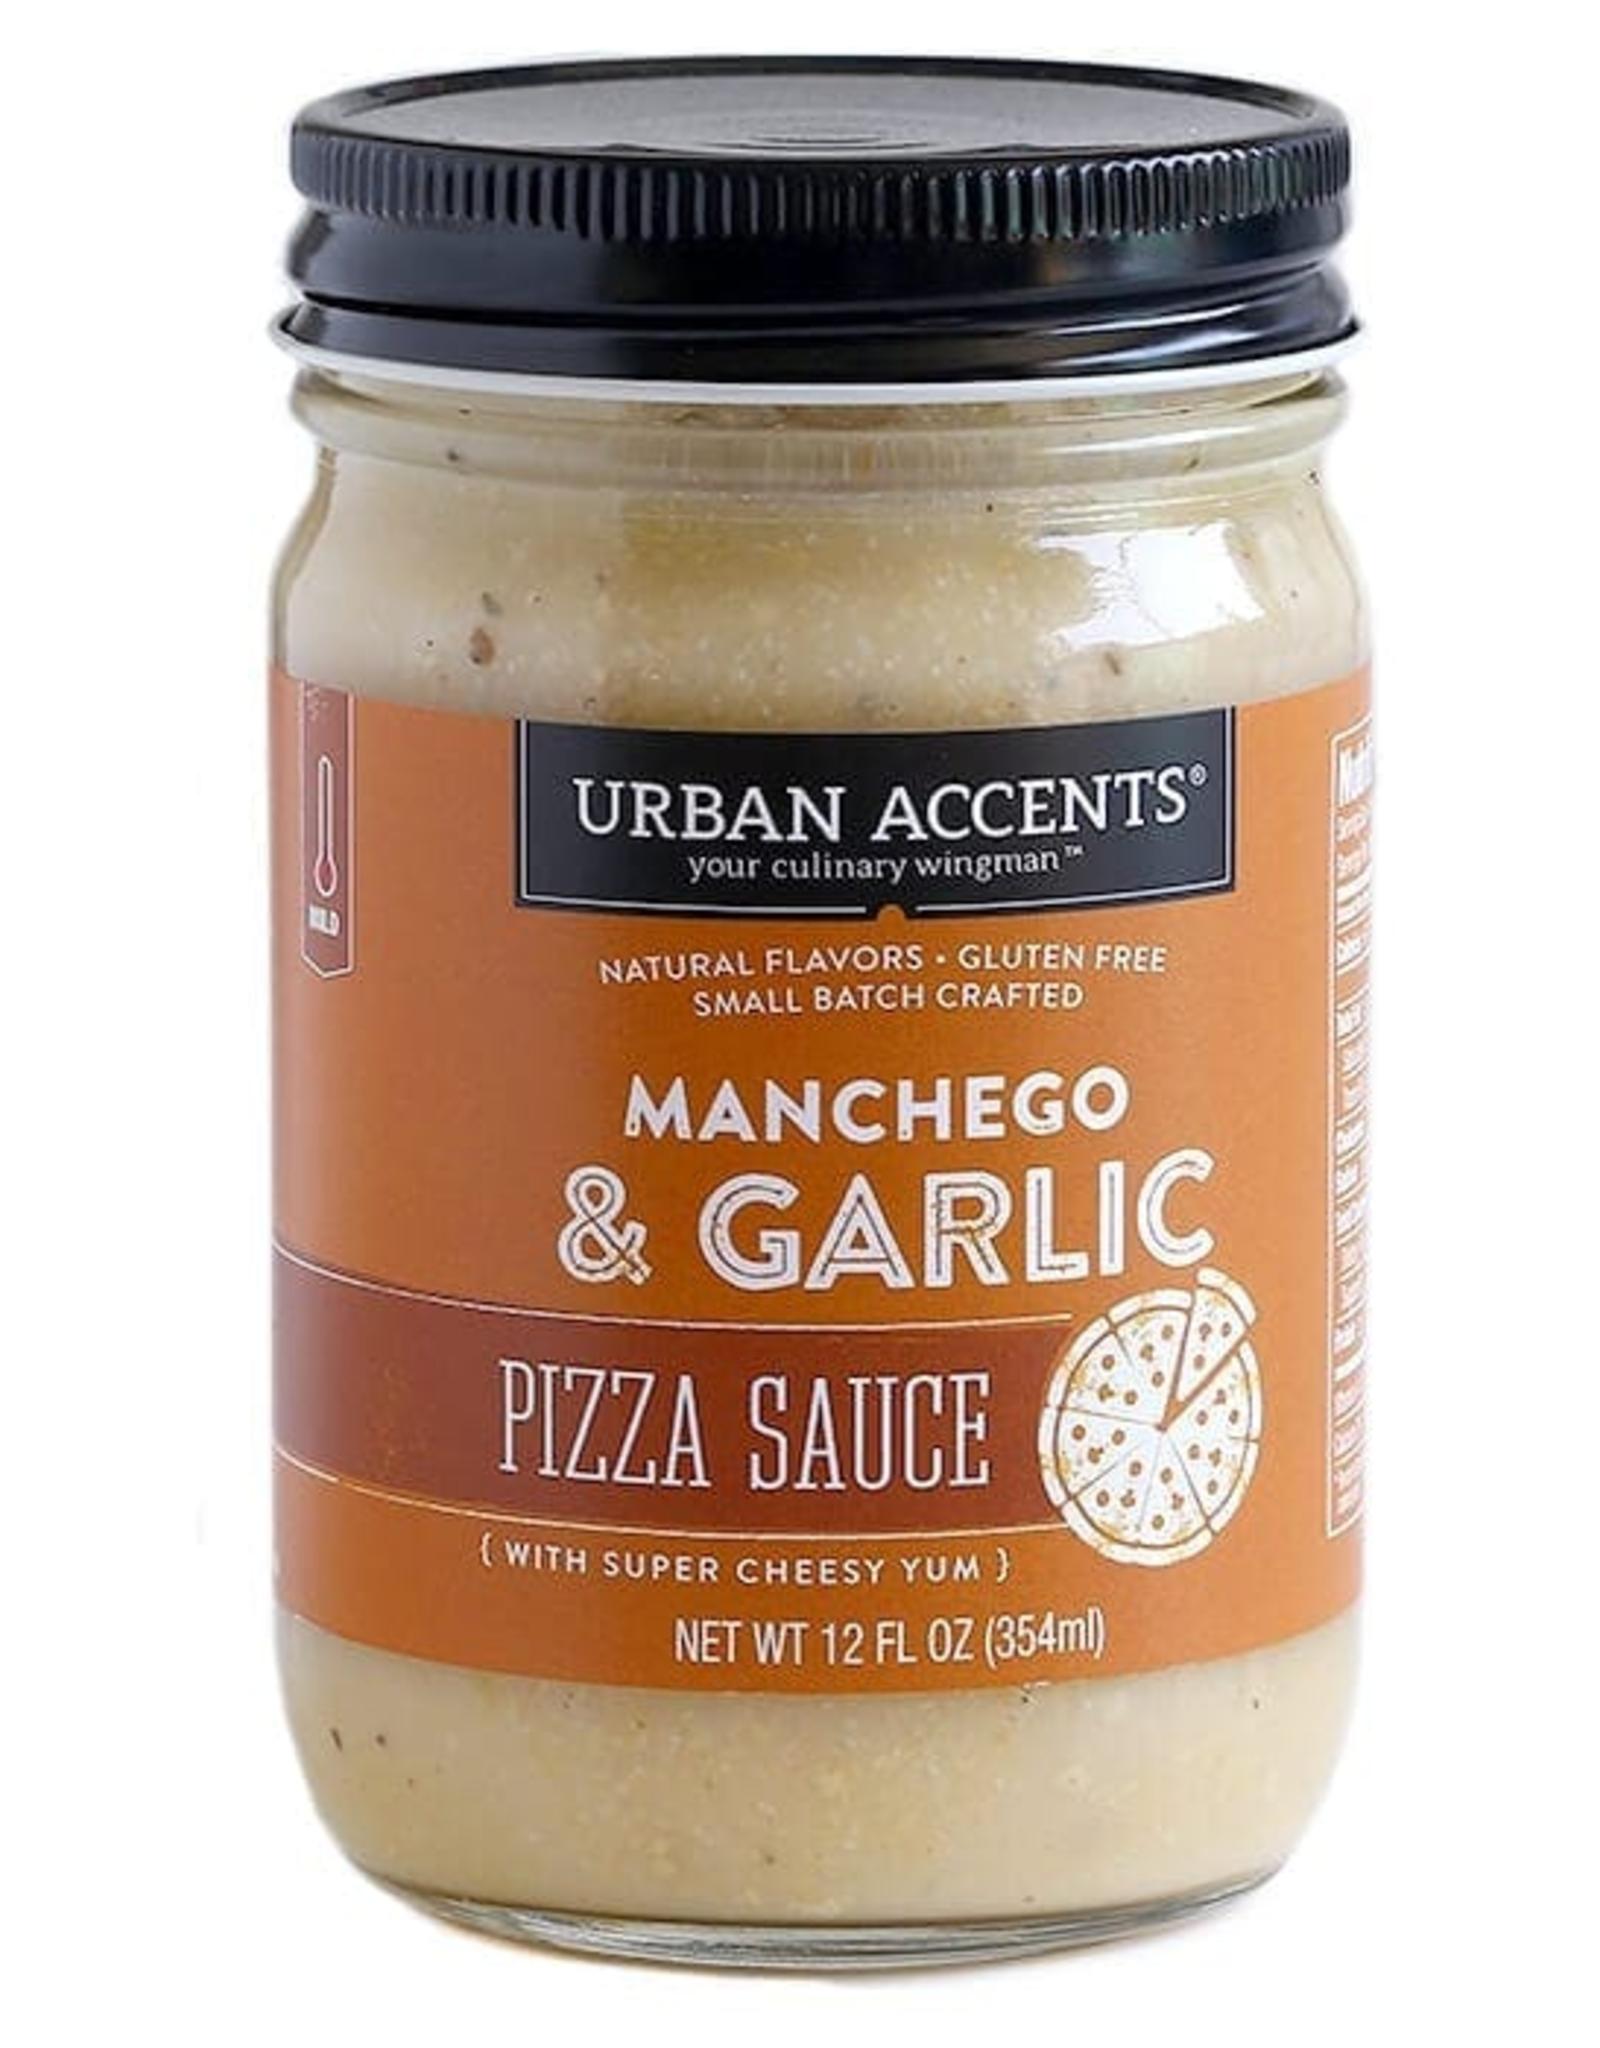 Urban Accents Pizza Sauce, Garlic Manchego